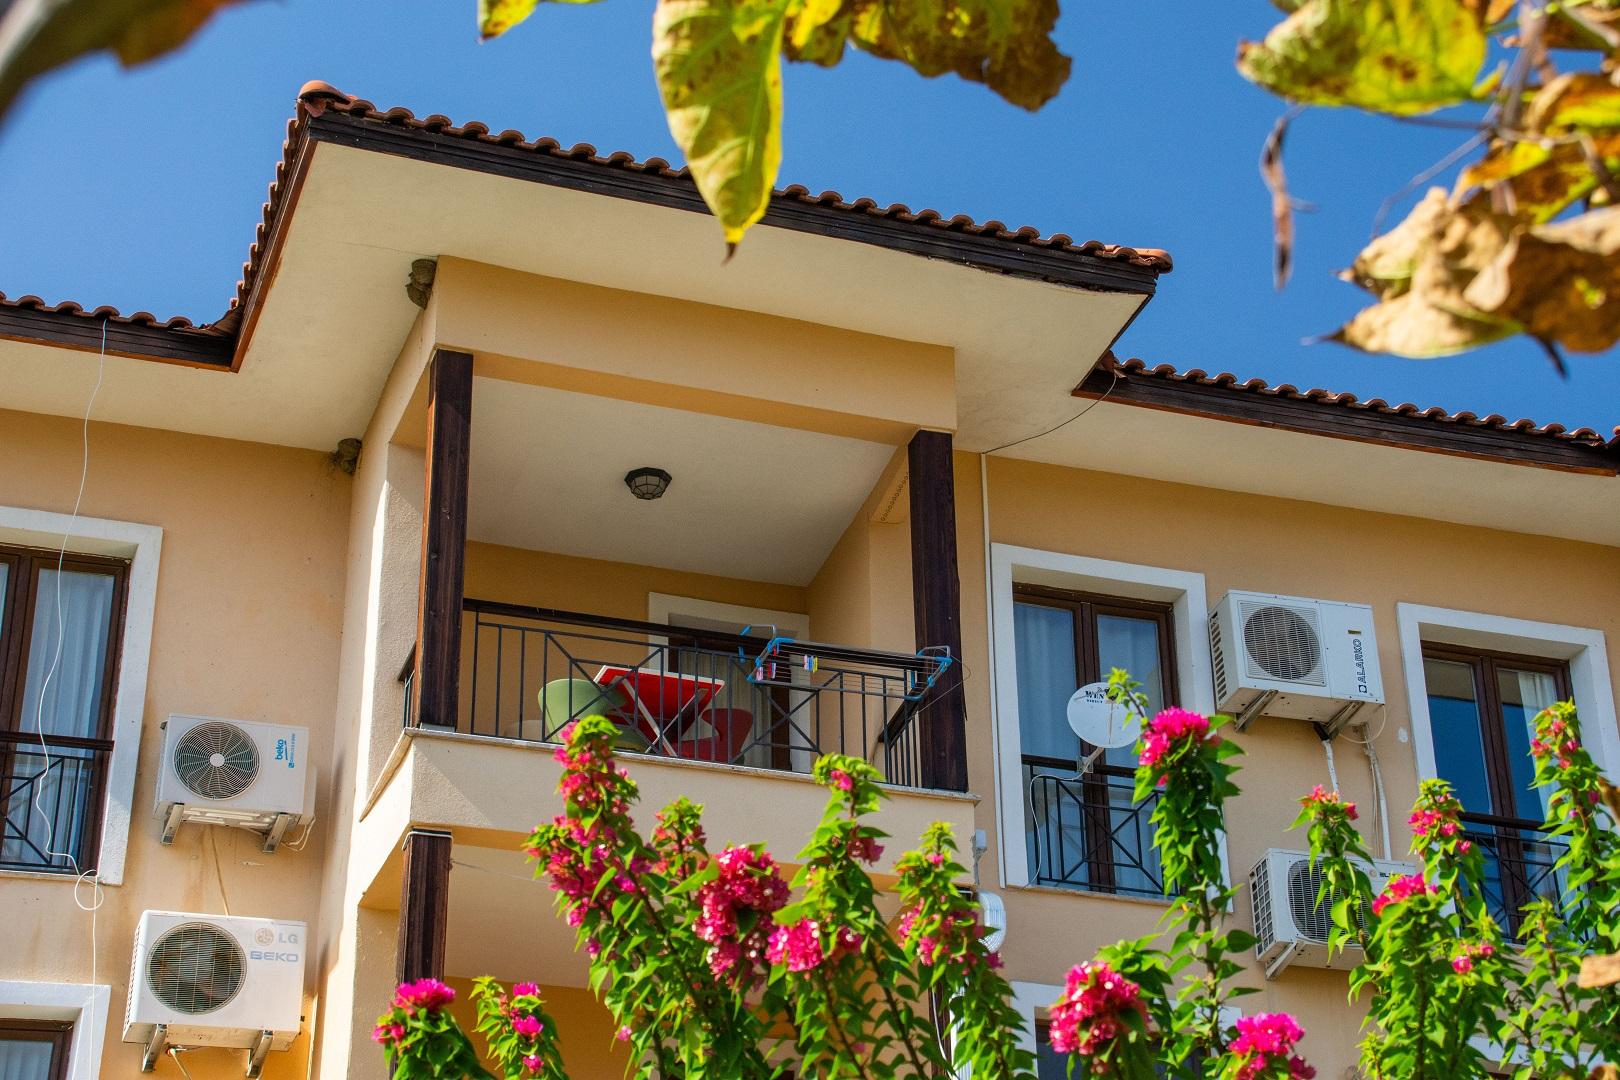 Two-Bedroom Seaview apartment for sale in göcek